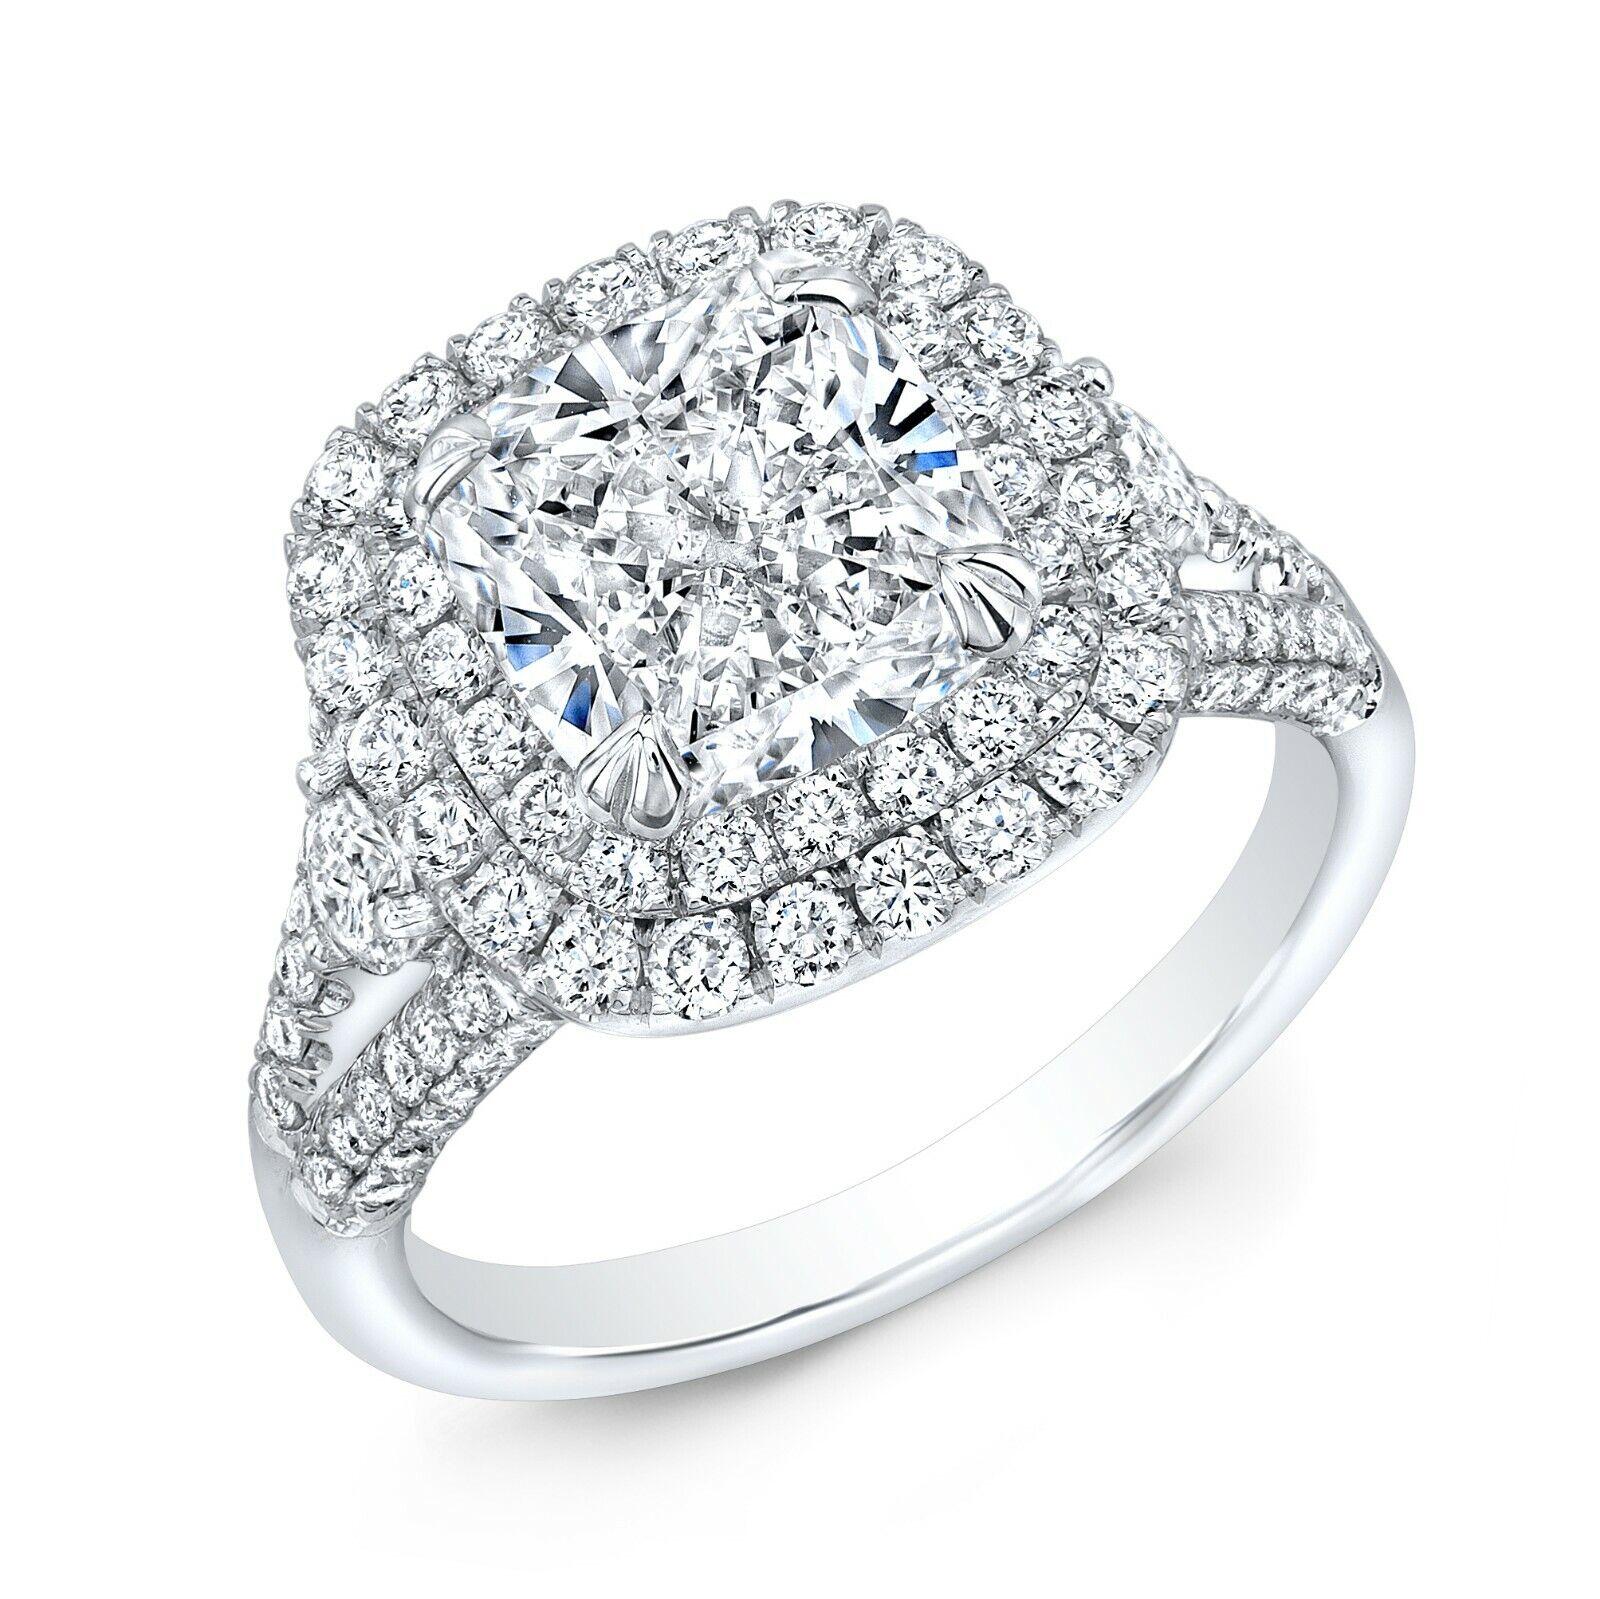 2.60 TCW Natural Cushion Double Halo Split Shank Diamond Engagement Ring - GIA